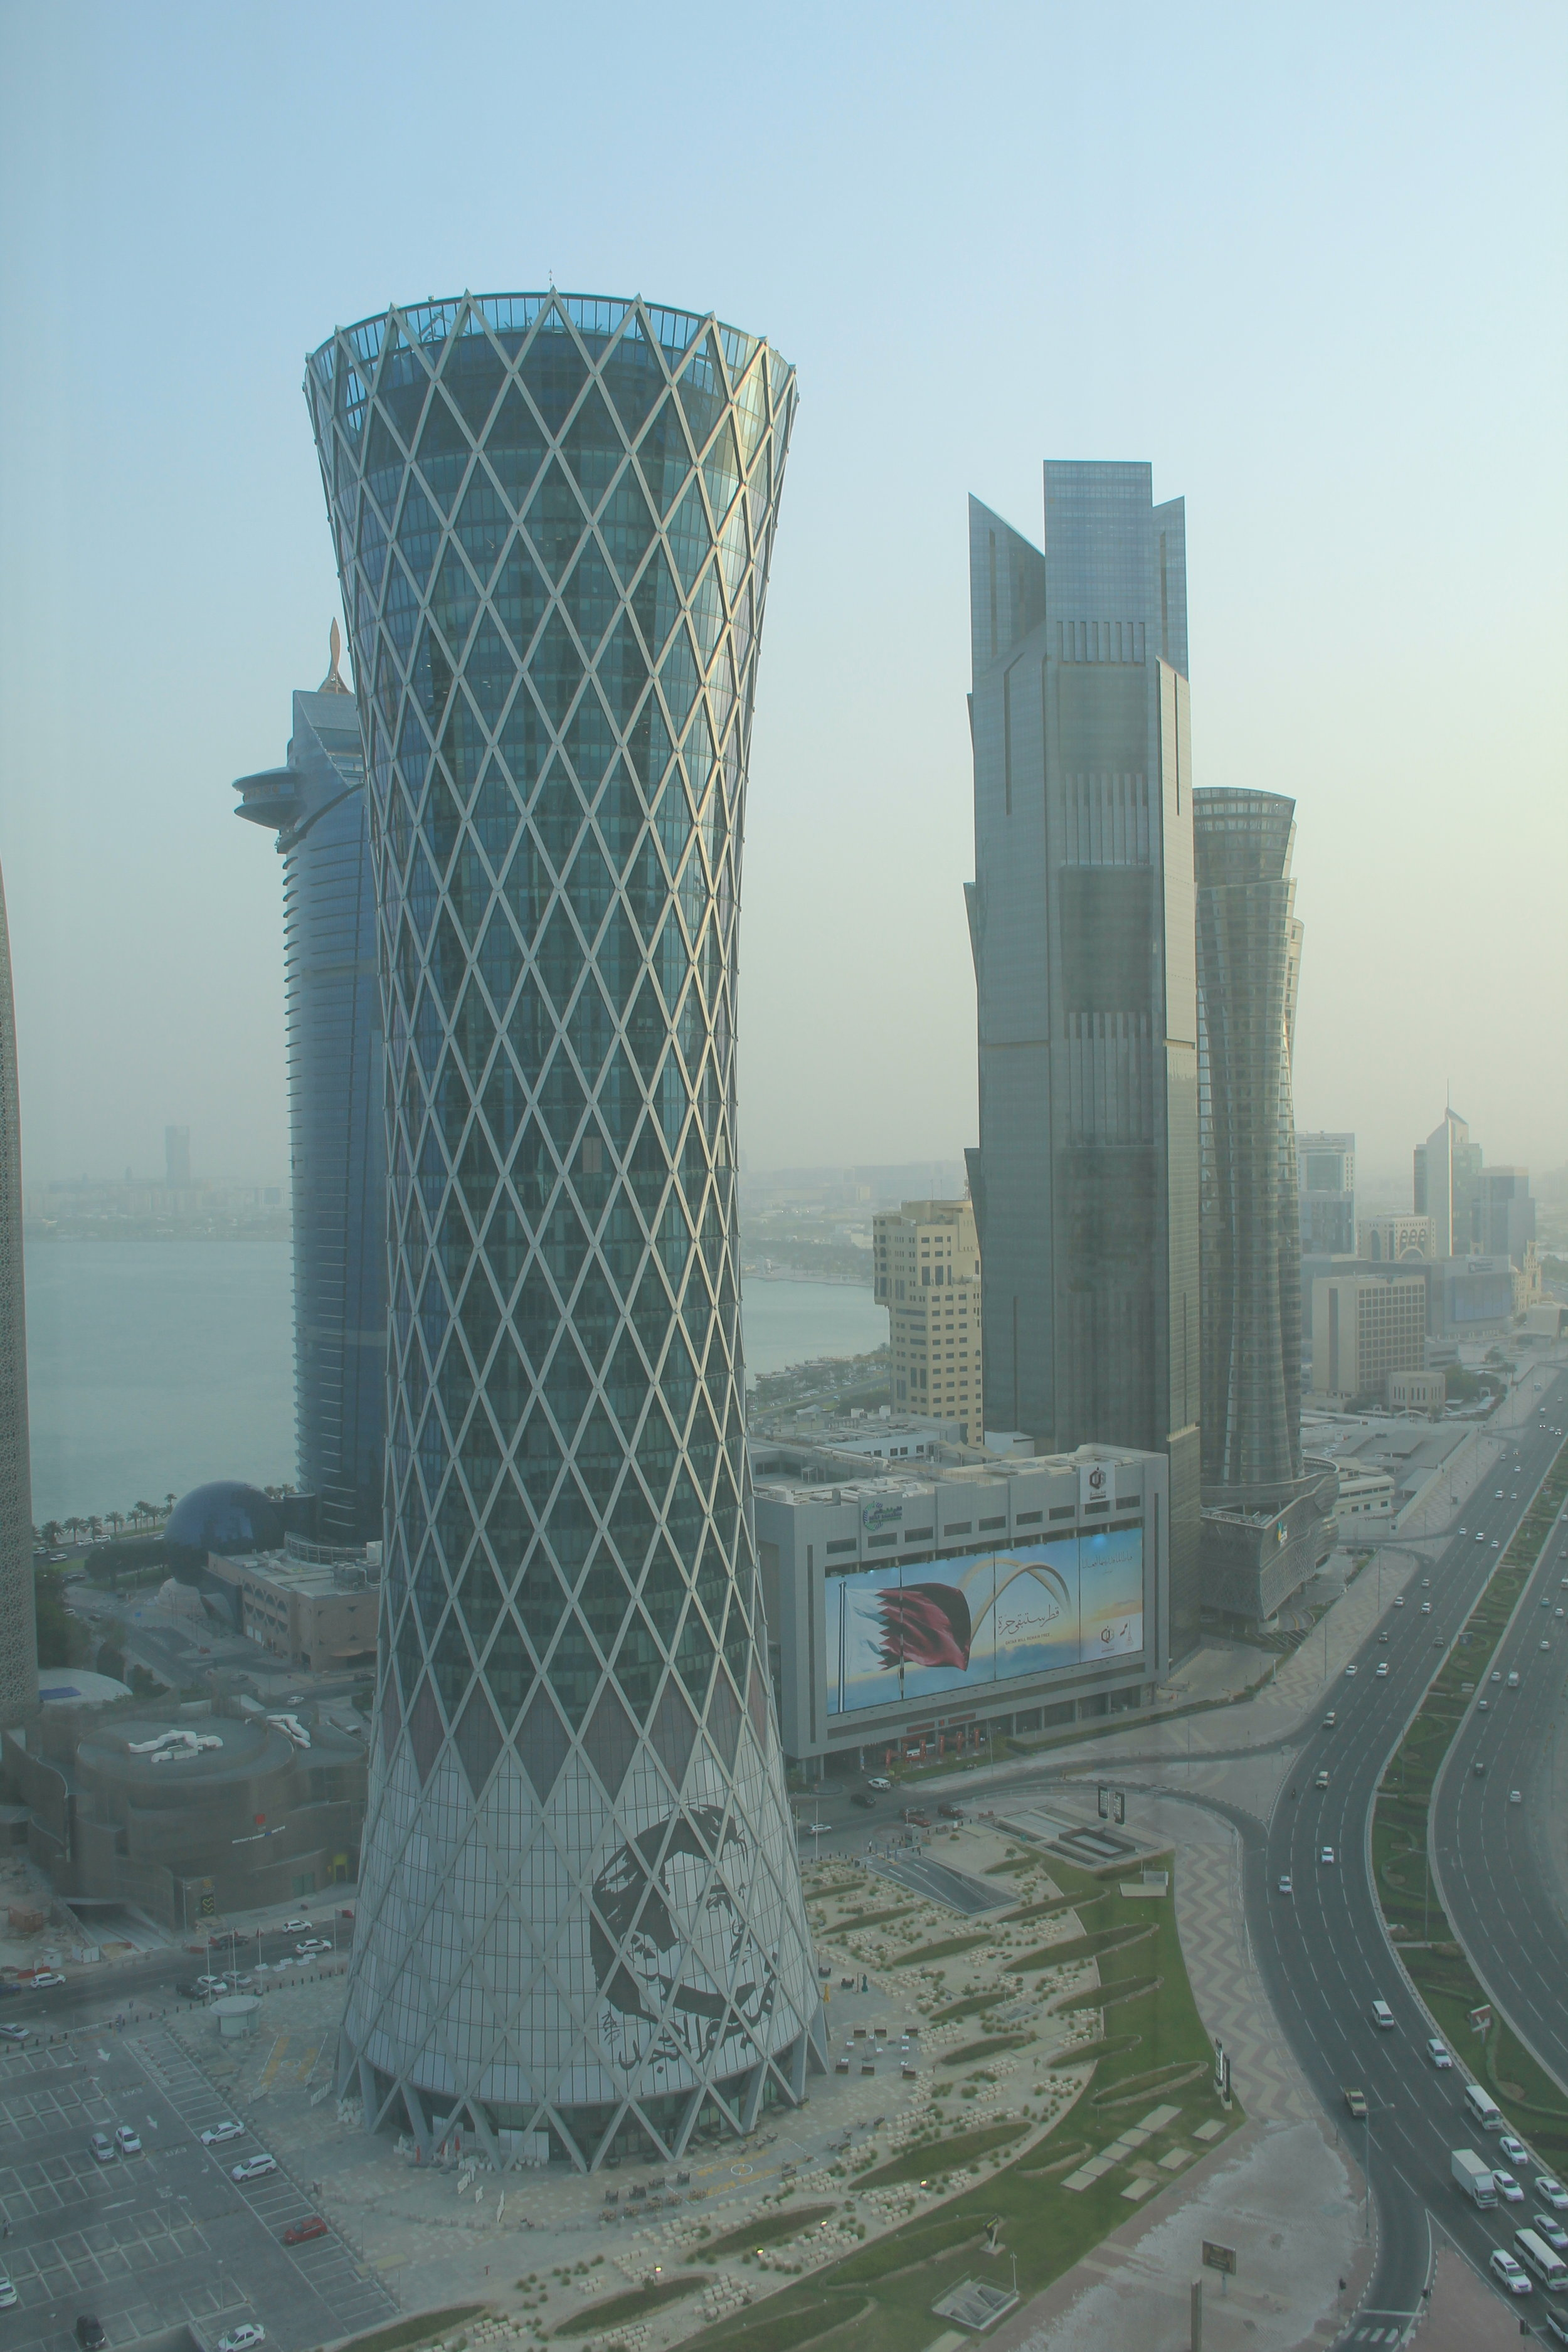 Tamim on Tornado Tower. Tornado Tower, West Bay, Doha, Qatar. Photo taken by: Tyanna LC